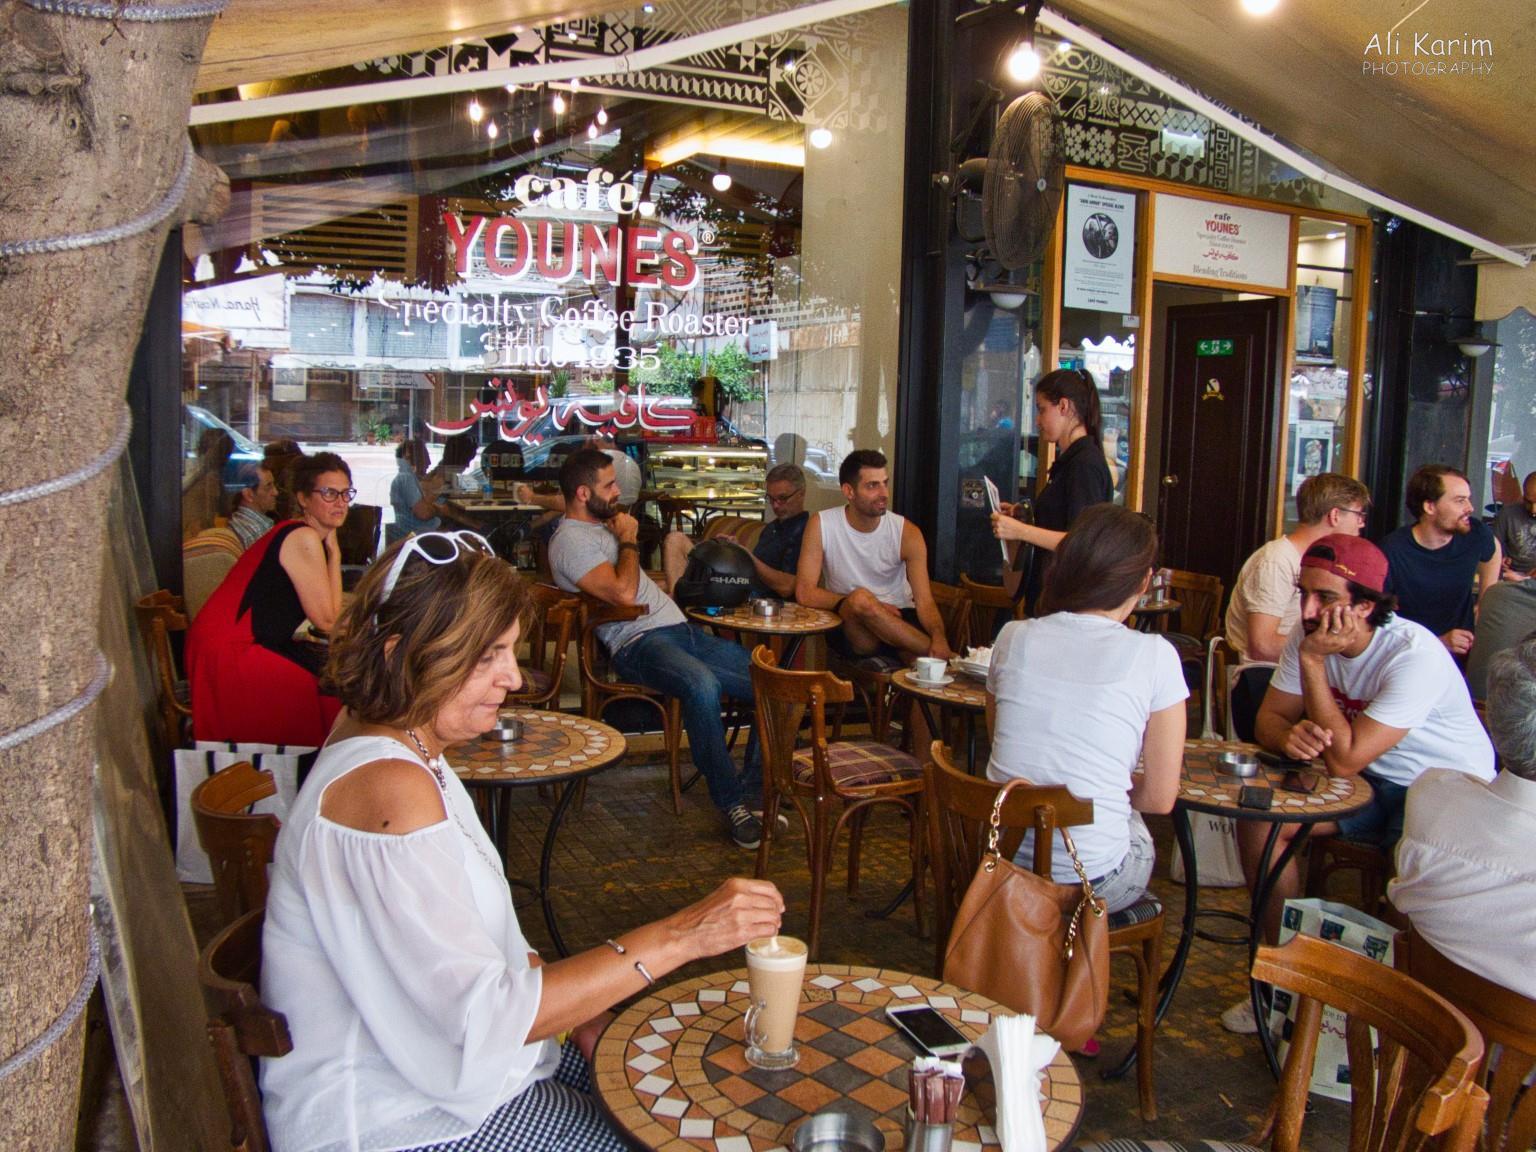 Coffee shop patios like Café Younes are everywhere